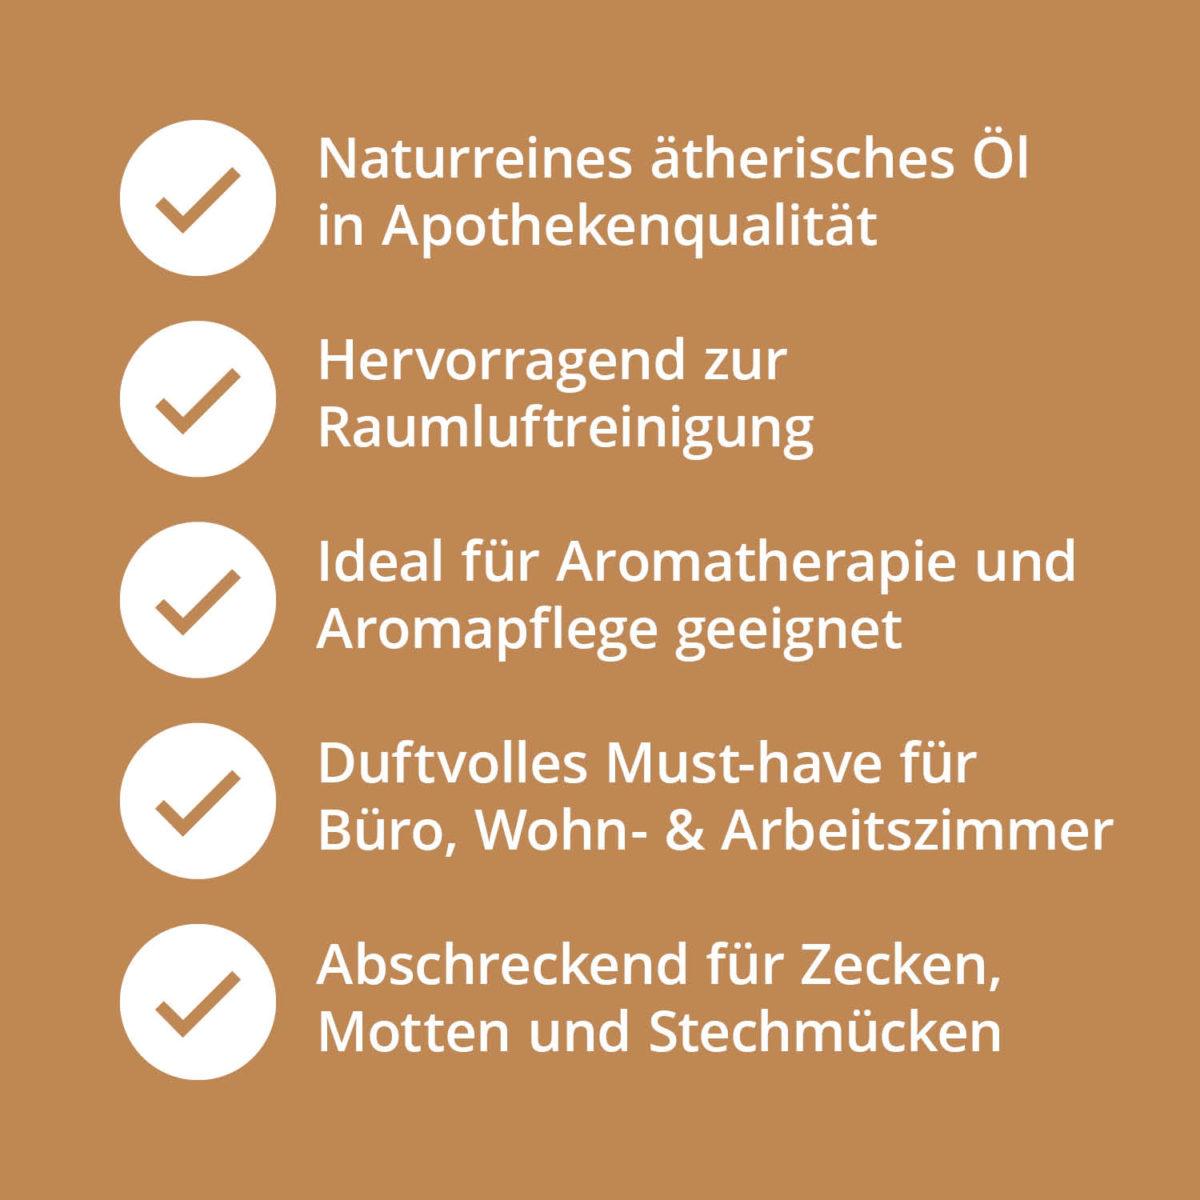 Casida natural pure Stone Pine Oil – 10 ml 16486743 PZN Apotheke Zirbelkiefernöl ätherische Öle Diffuser7